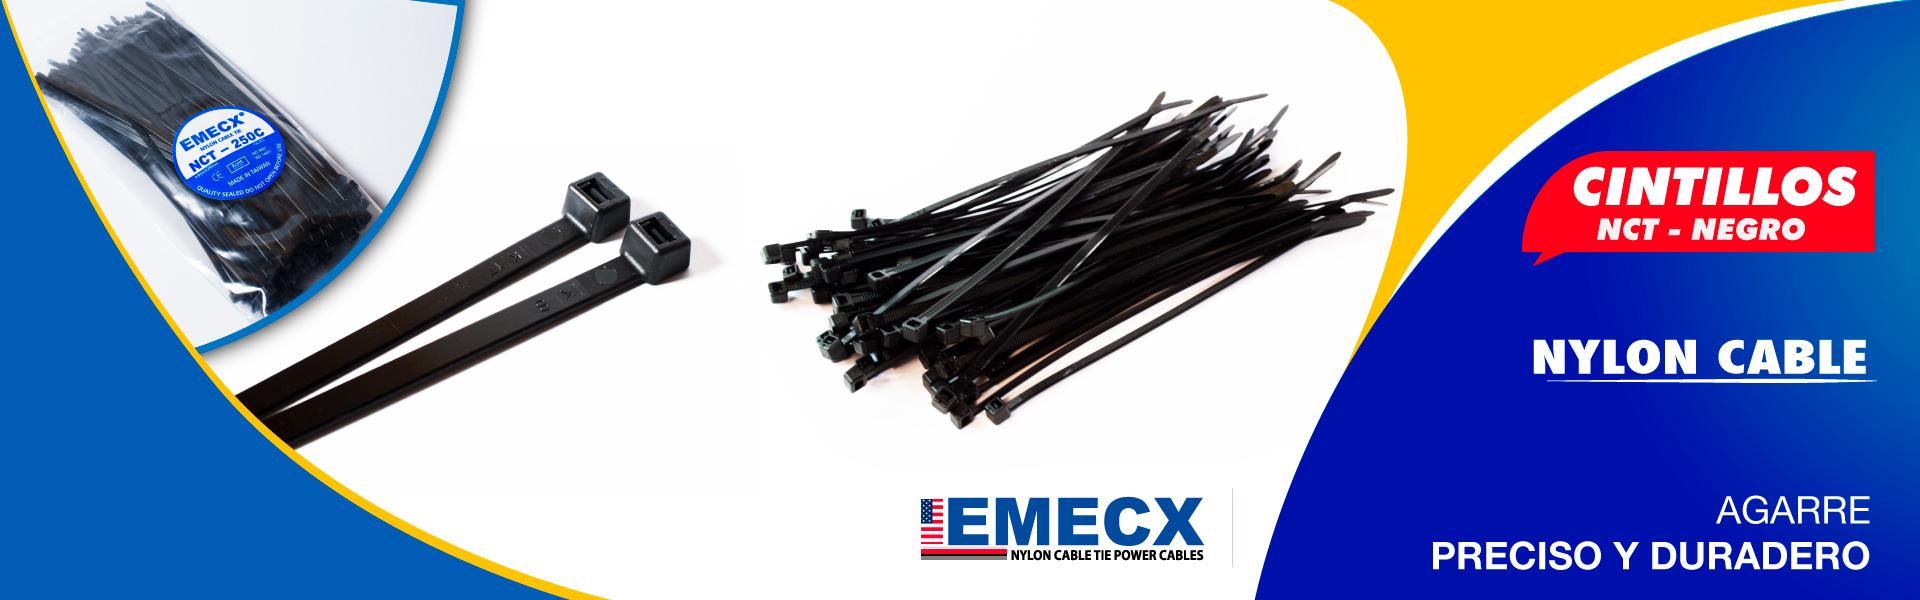 emecx-cintillos-negro